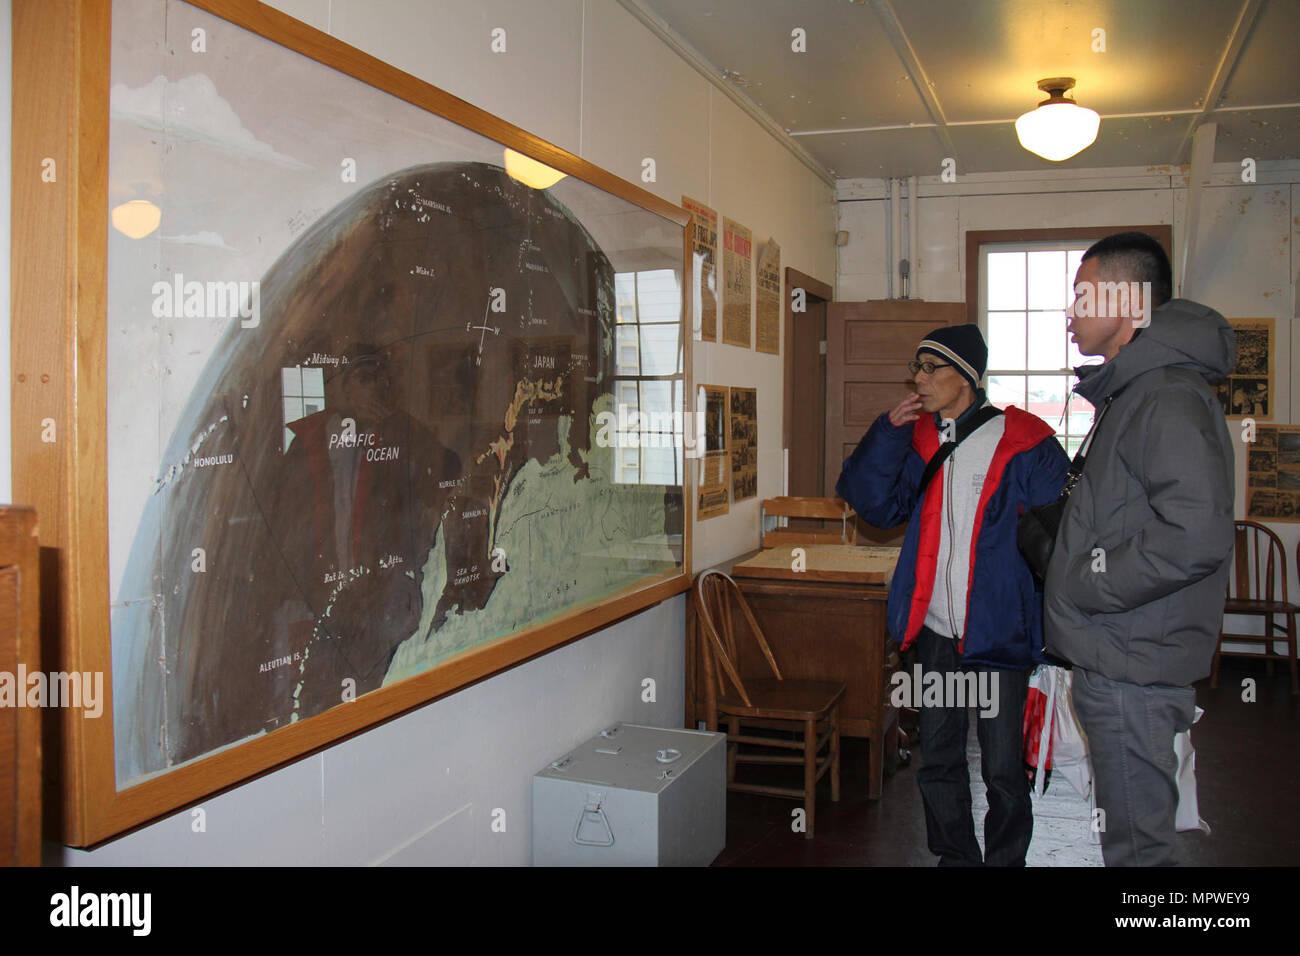 Shinji ichiyanagi left and his nephew takashi minda look at a map shinji ichiyanagi left and his nephew takashi minda look at a map painted during world war ii by a japanese prisoner of war held at camp mccoy gumiabroncs Images